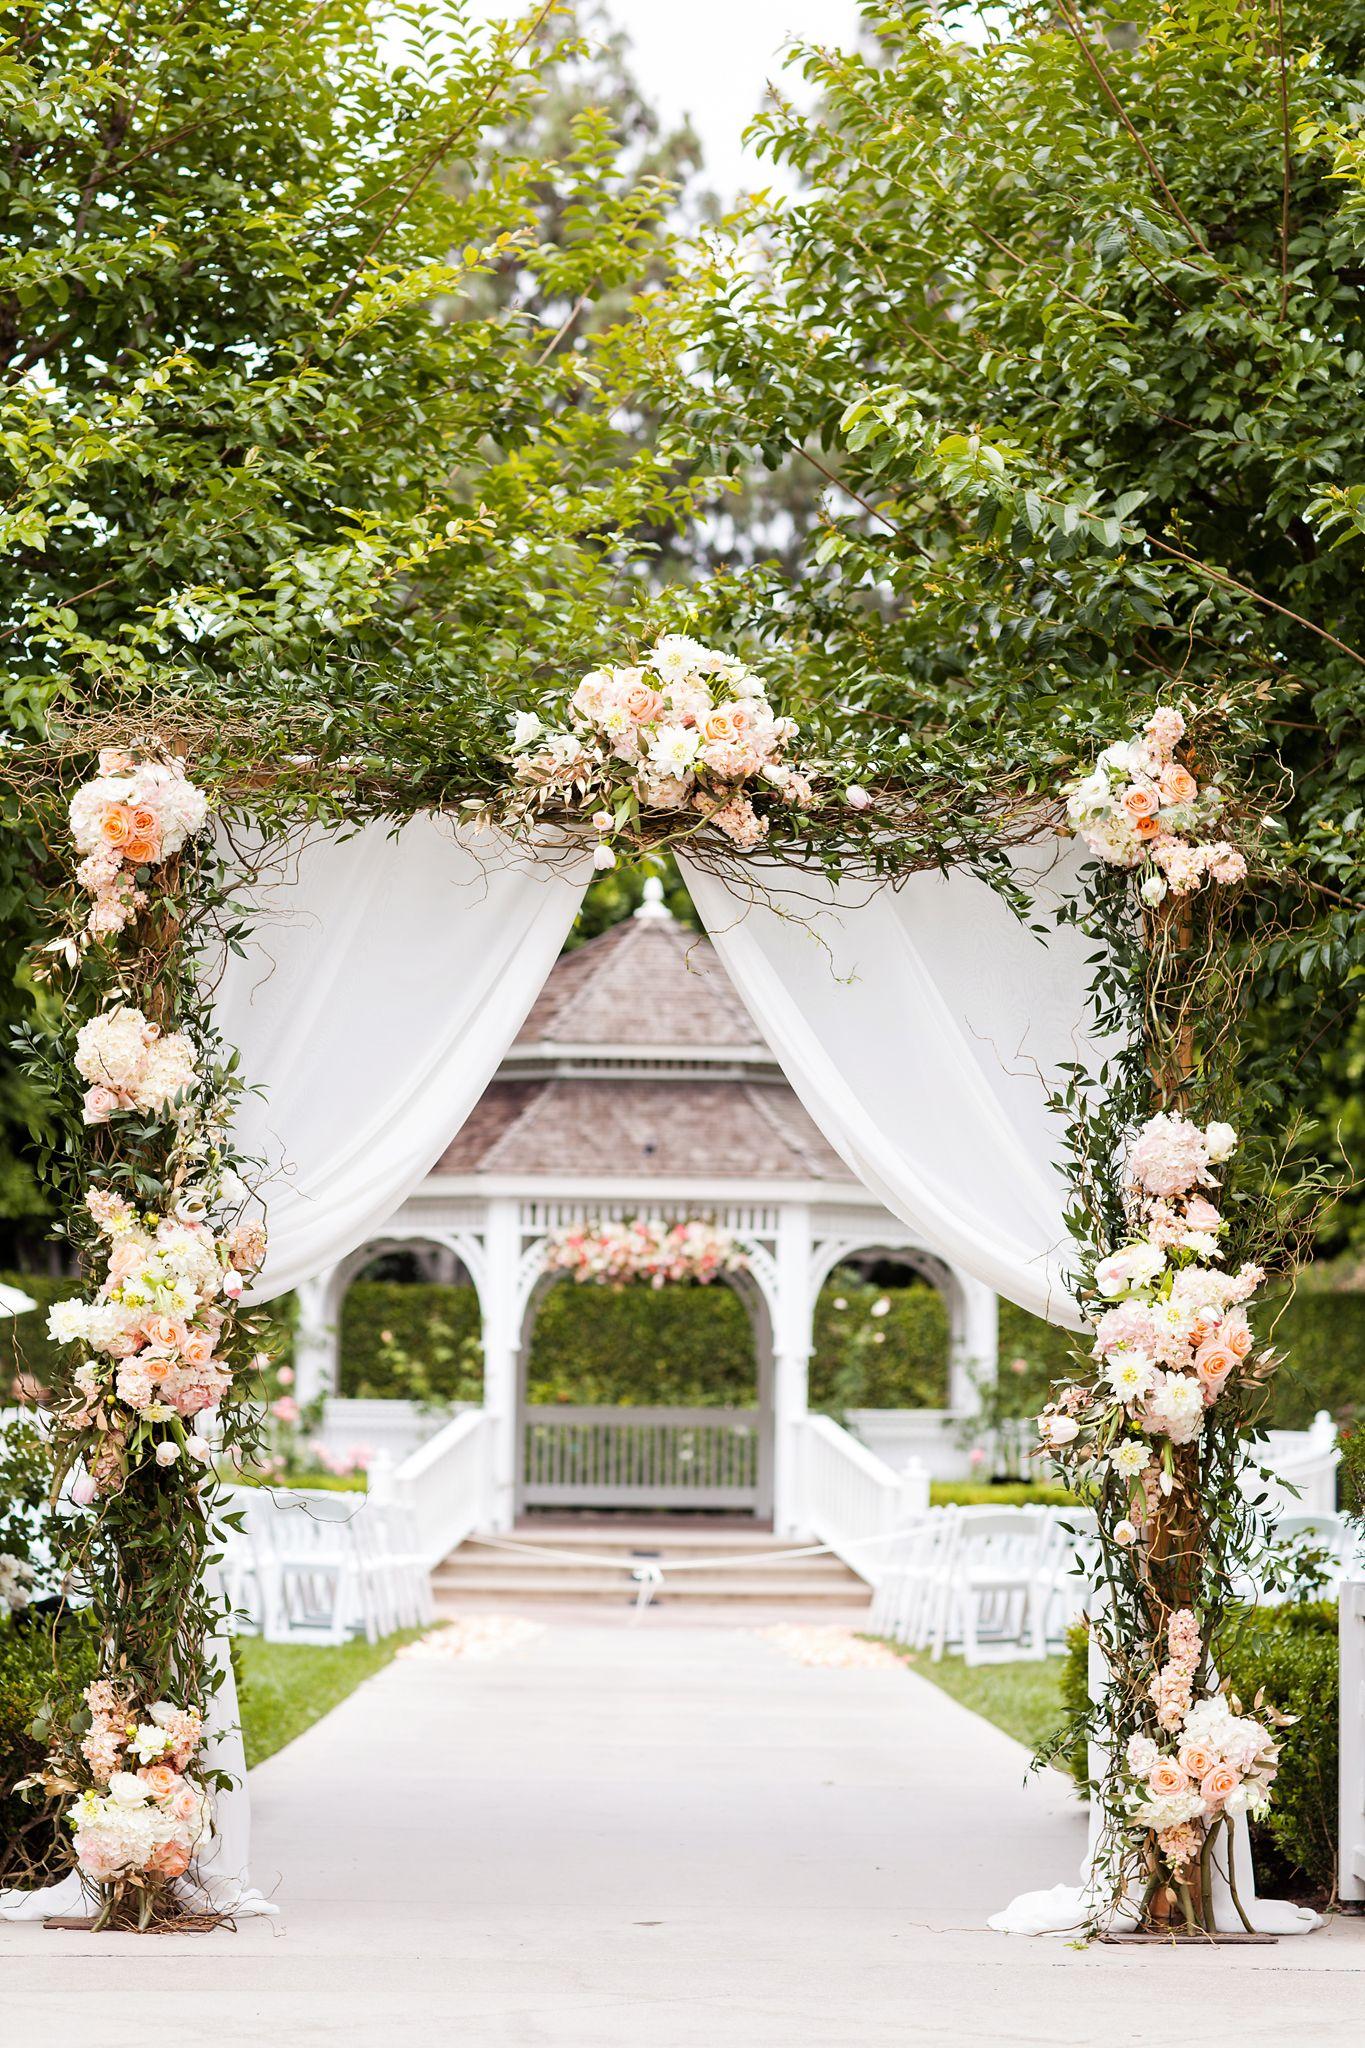 small beach wedding ceremony ideas%0A Pretty wedding venue More